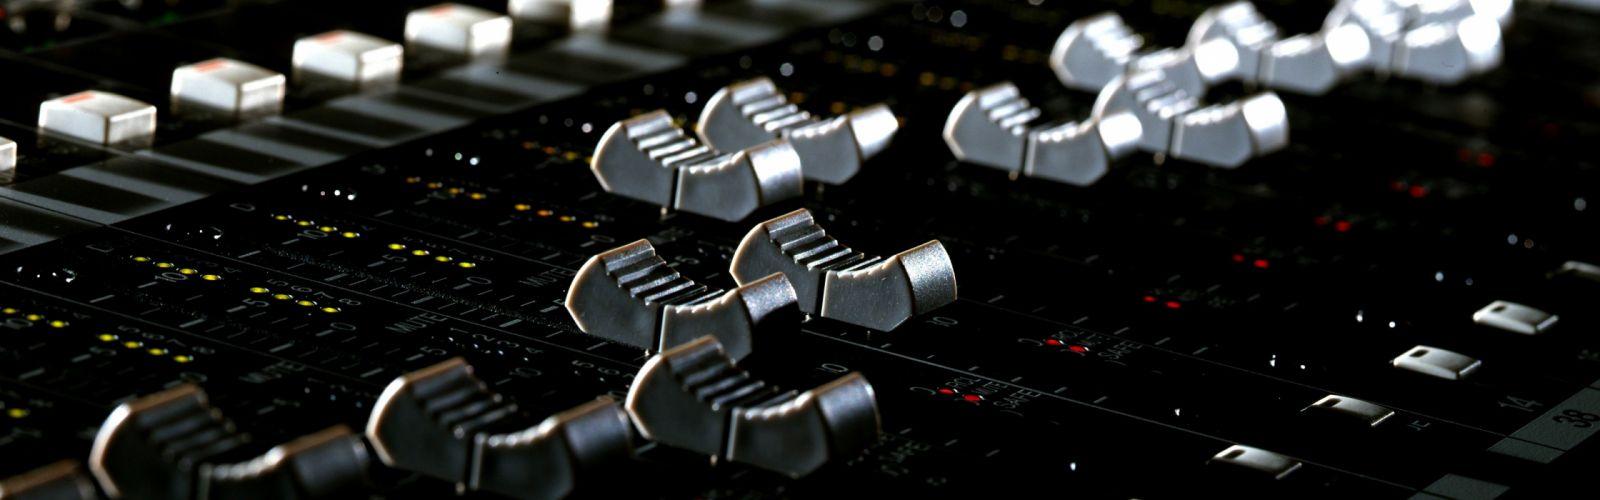 music mixing tables DJ Faders wallpaper